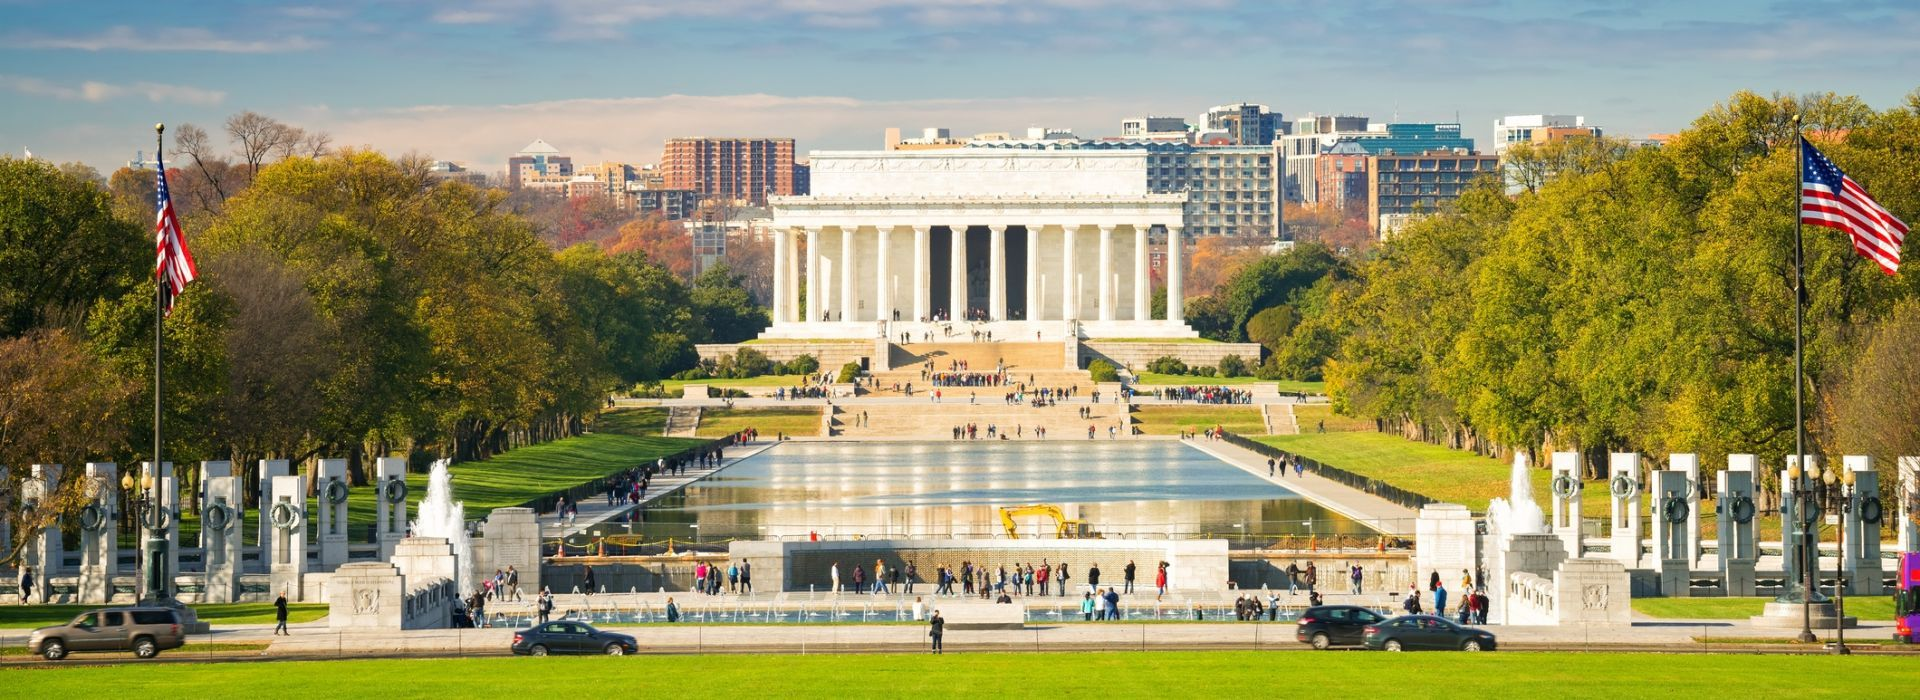 Photography tours in Washington D.C.